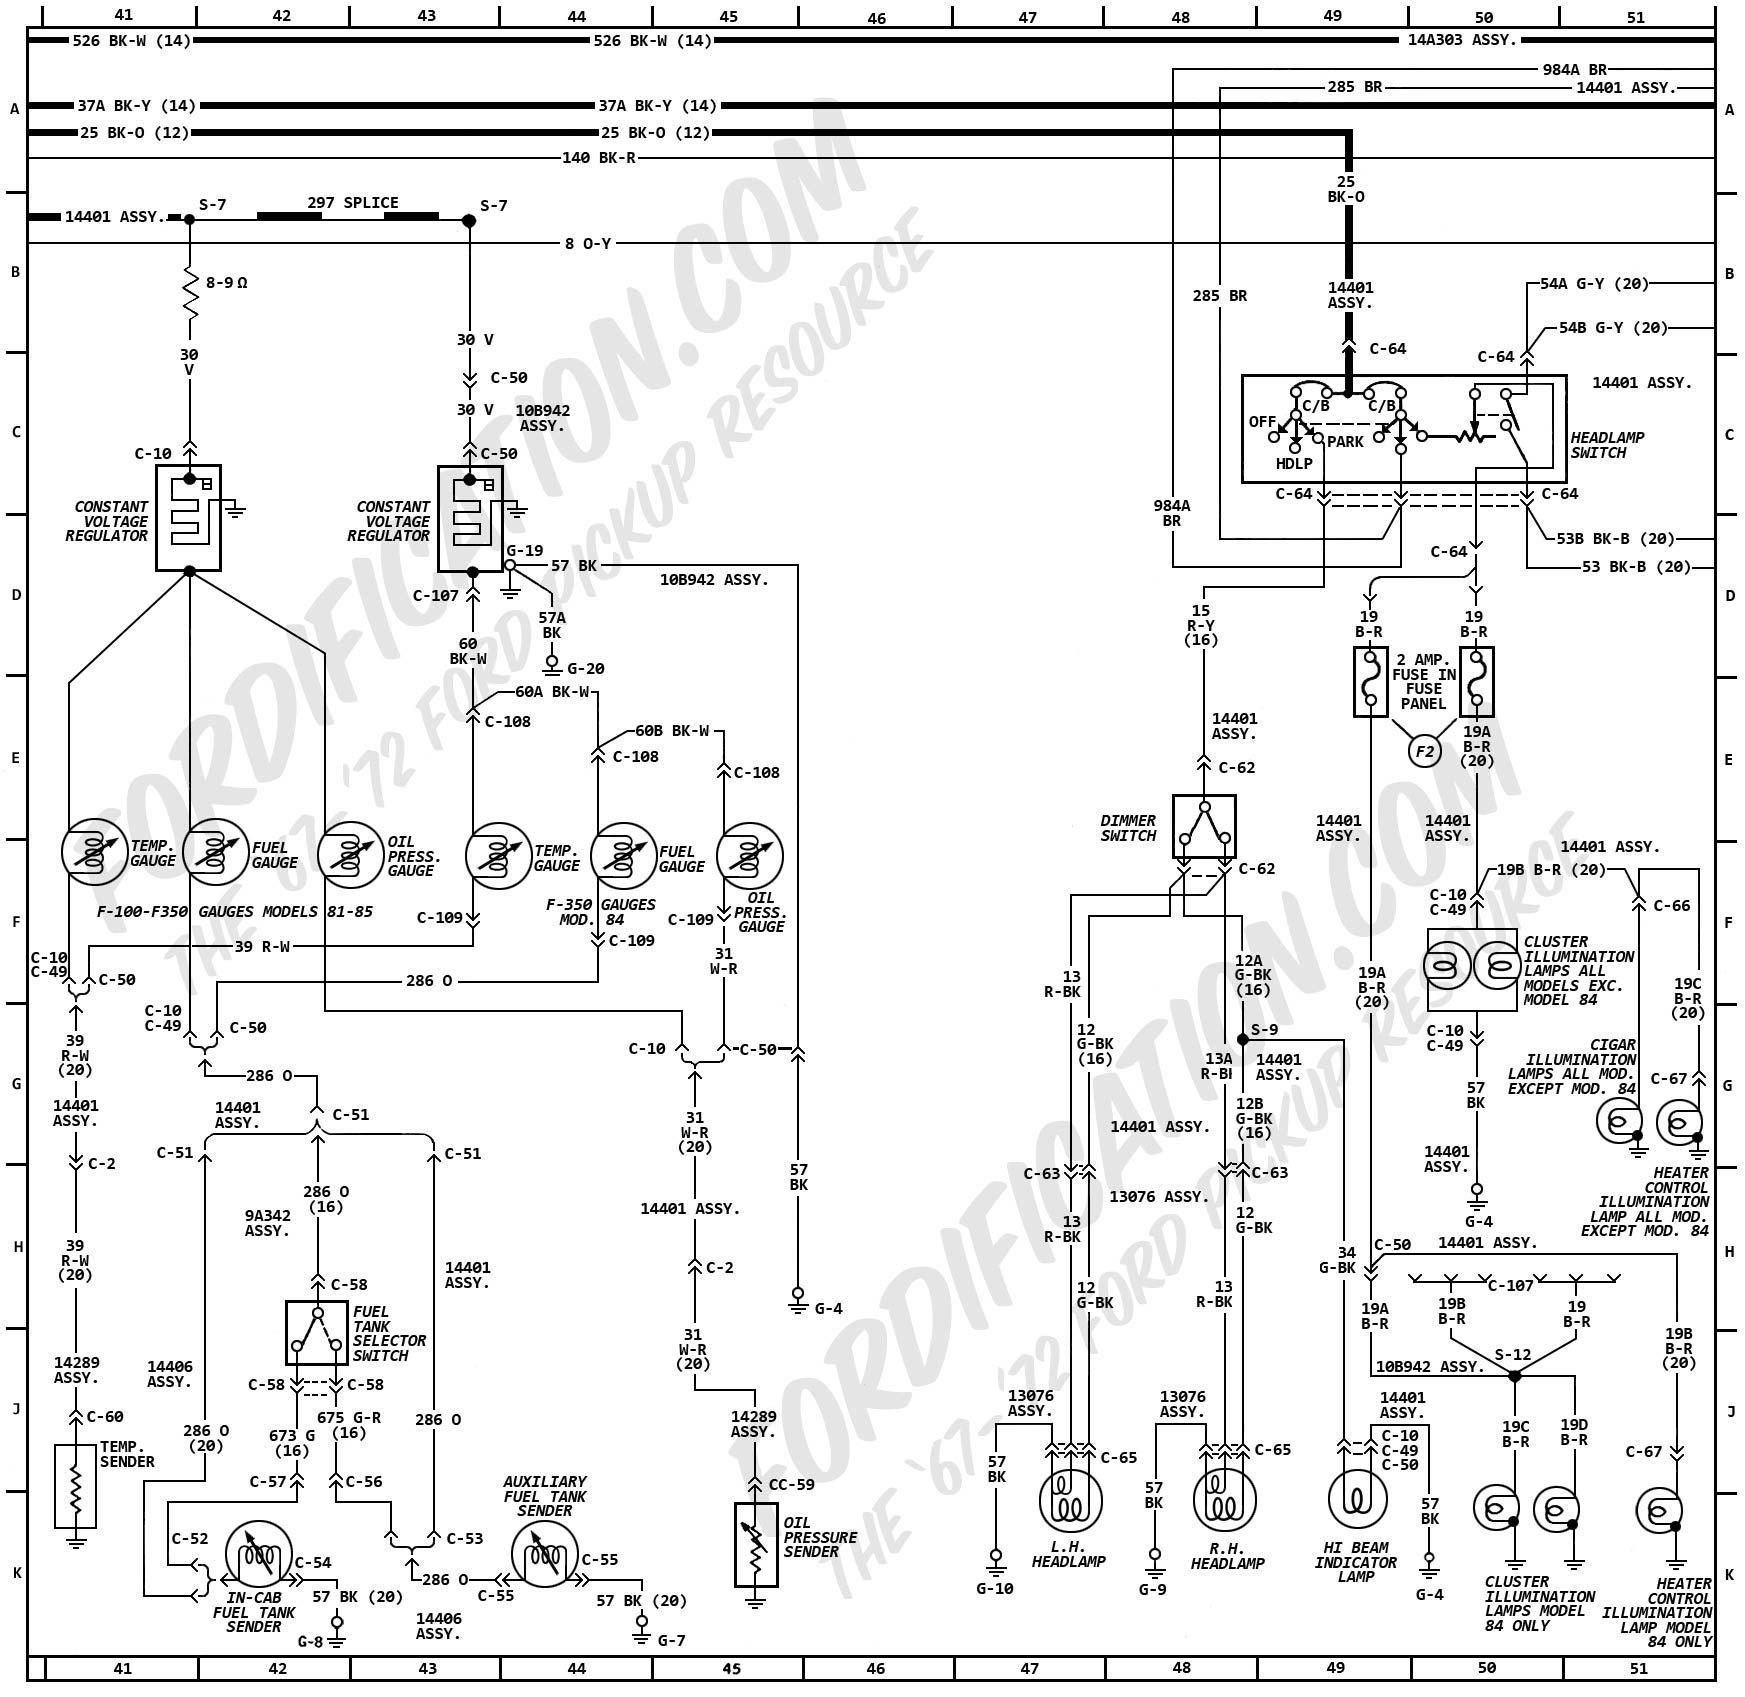 ford l8000 lighting diagram ae 7897  l9000 ford wiper wiring diagram on l8000 ford truck  l9000 ford wiper wiring diagram